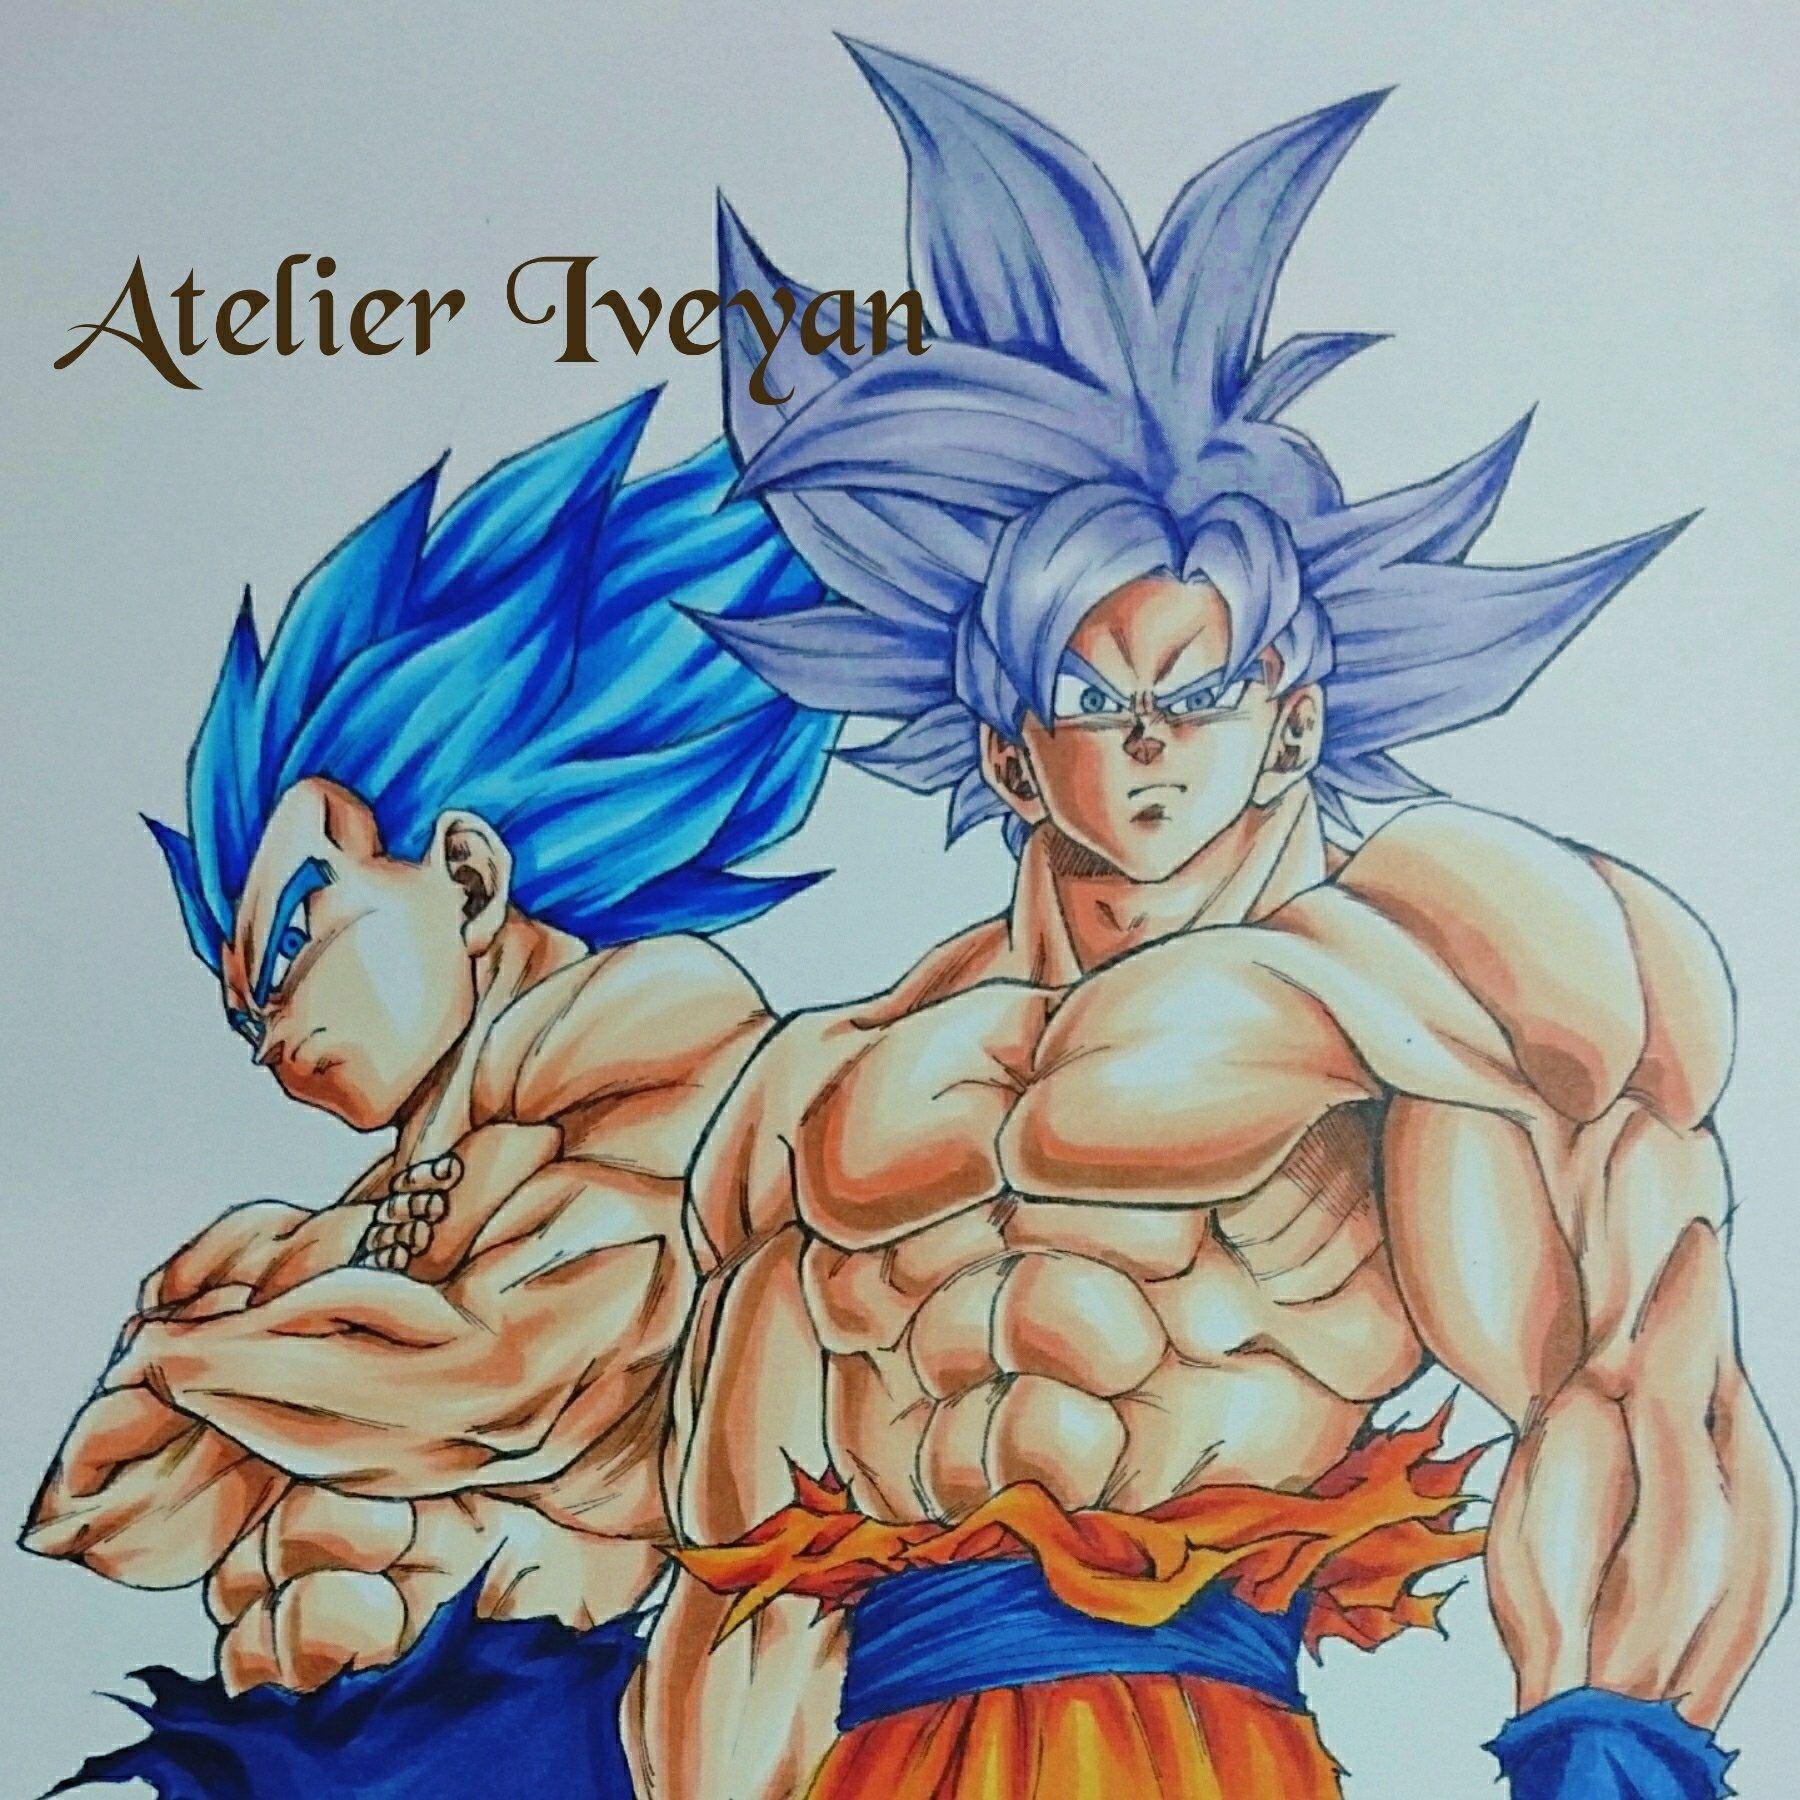 Ultra Instinct Goku And Super Saiyan Blue Evolution Vegeta Super Saiyan Blue Goku Super Saiyan God